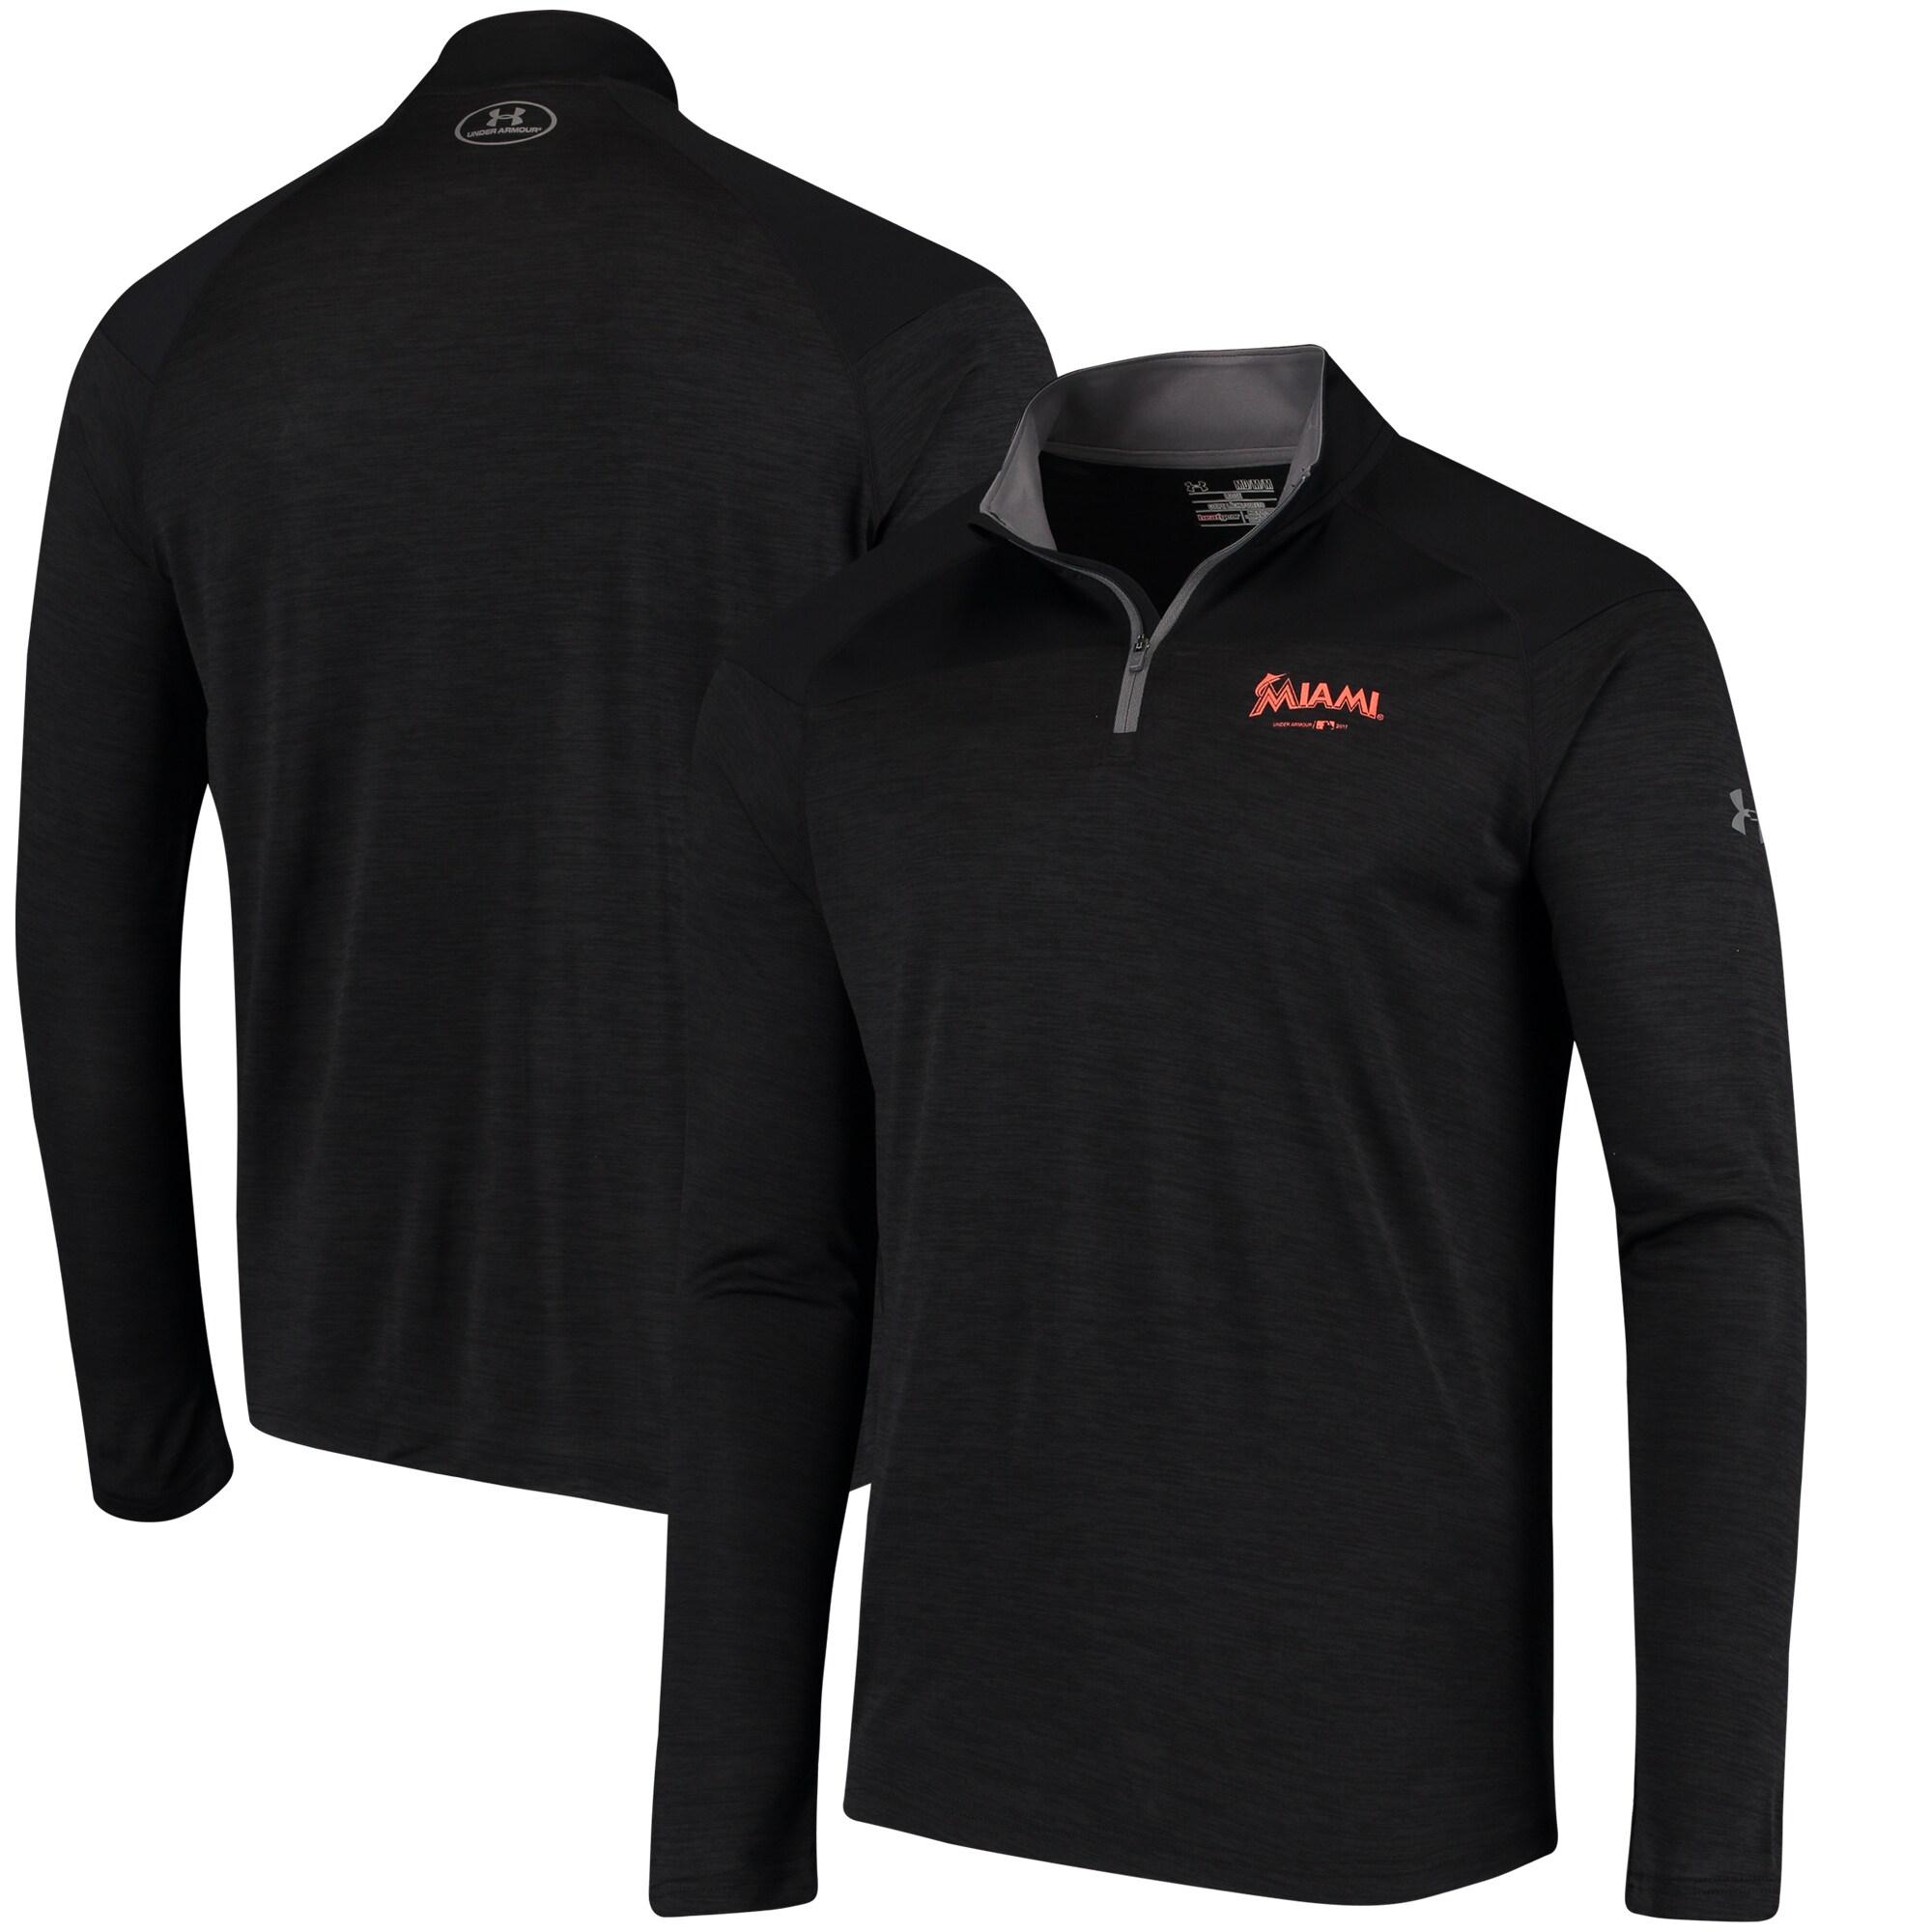 Miami Marlins Under Armour Tech Tonal Twist Quarter-Zip Pullover Jacket - Black